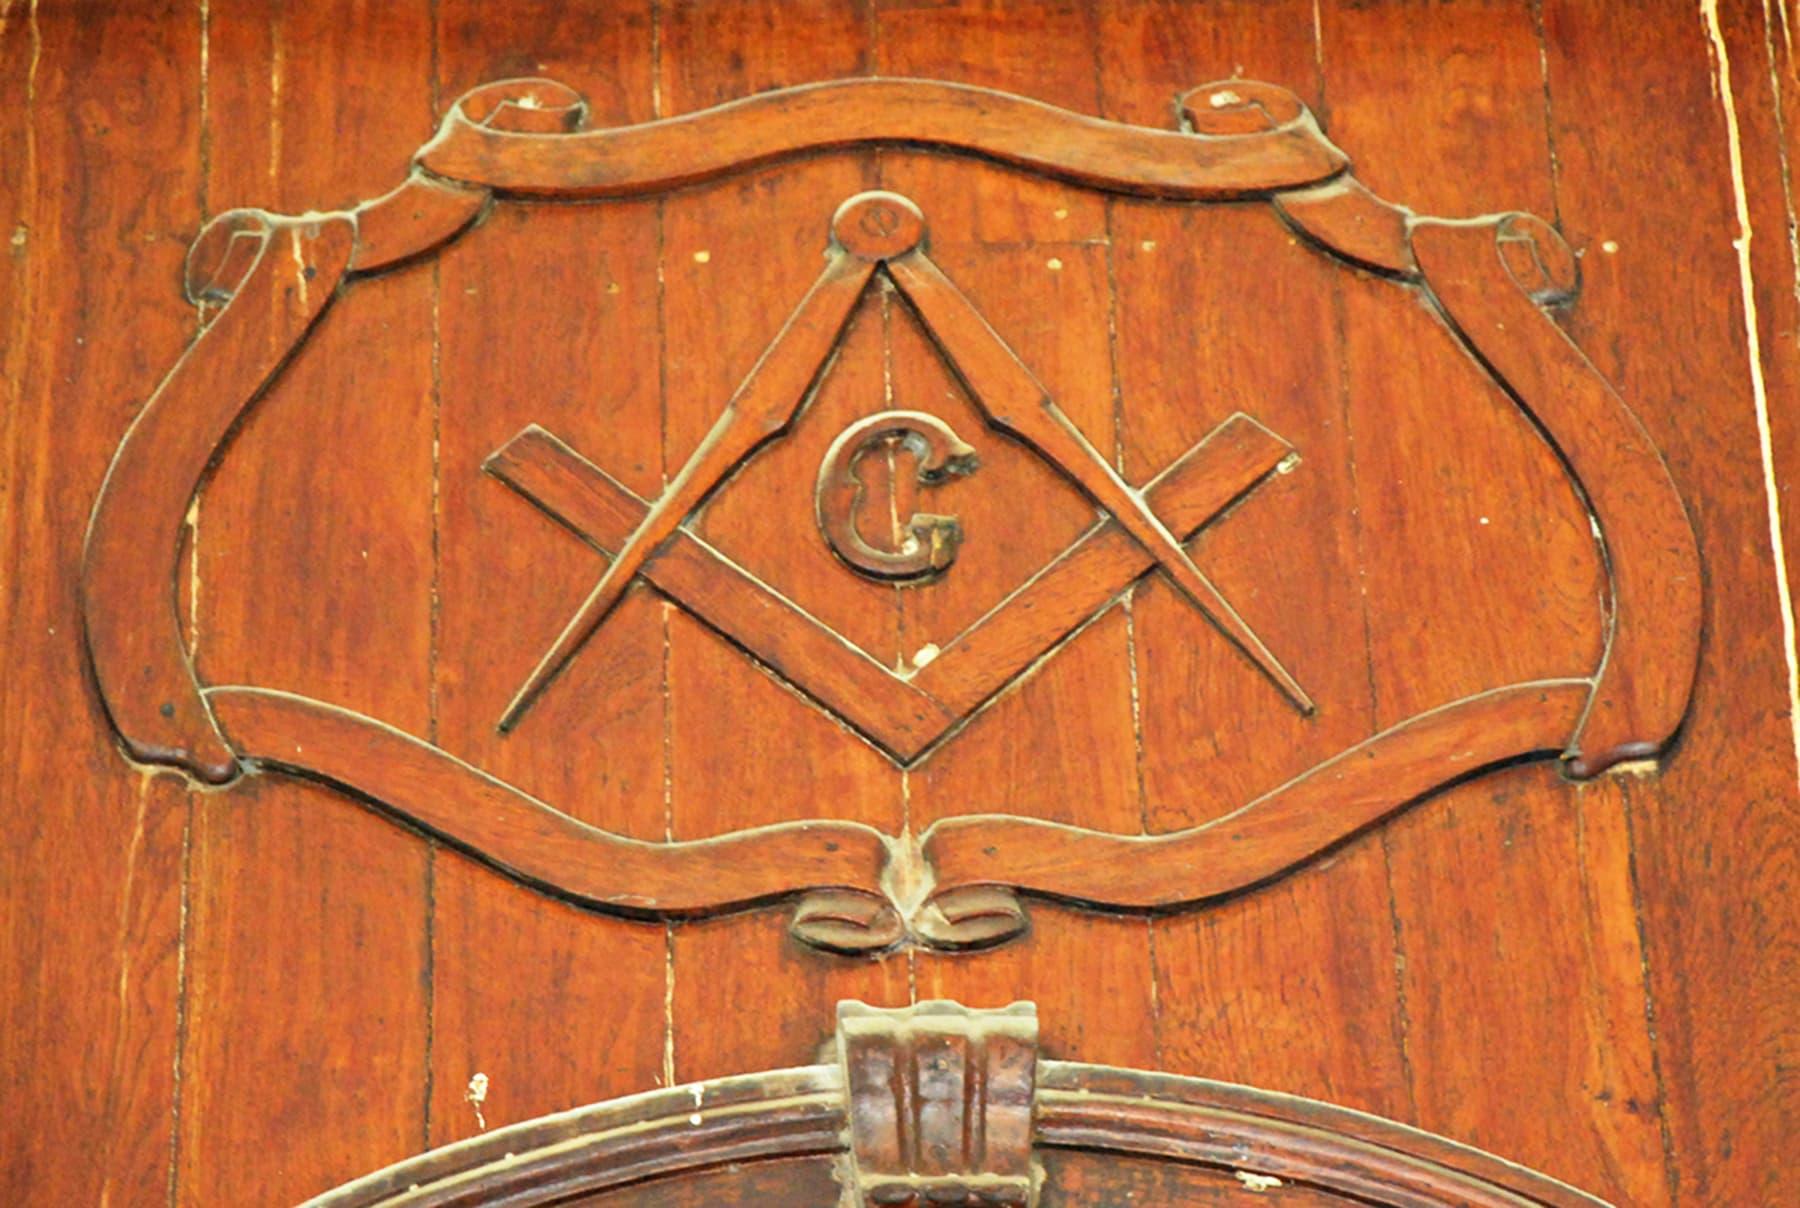 Freemasons Lodge still retains its iconic freemasonry symbols.